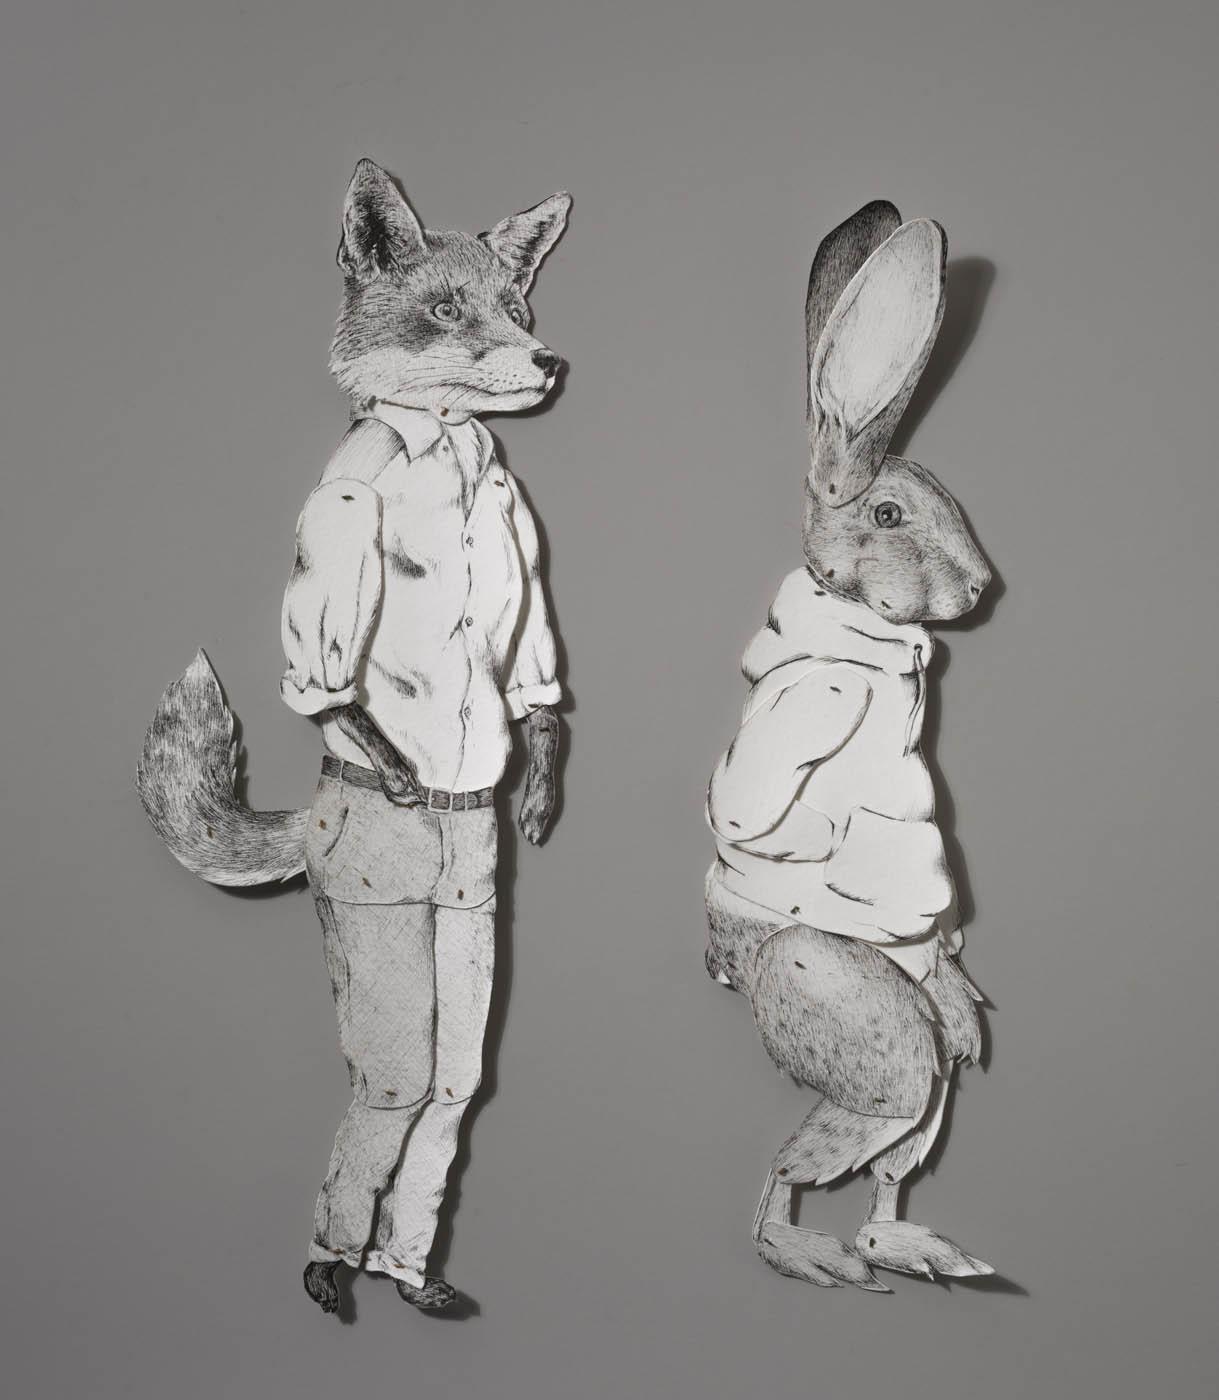 Ivy S. Johnson - Bro. Fox and Bro. Rabbit